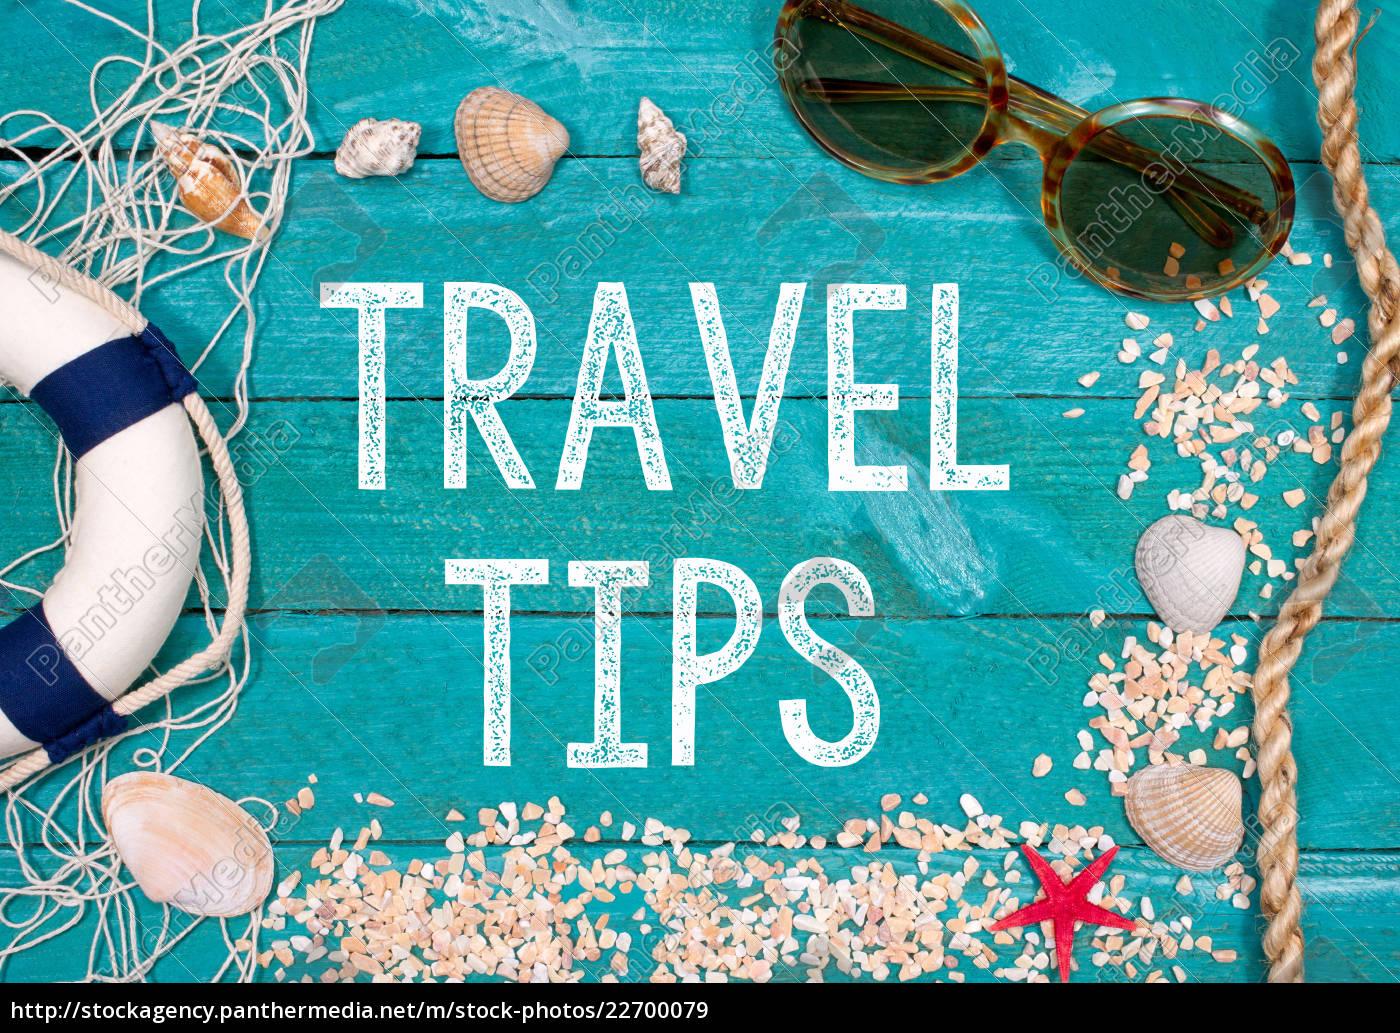 travel, tips, -, summer, beach, holidays - 22700079